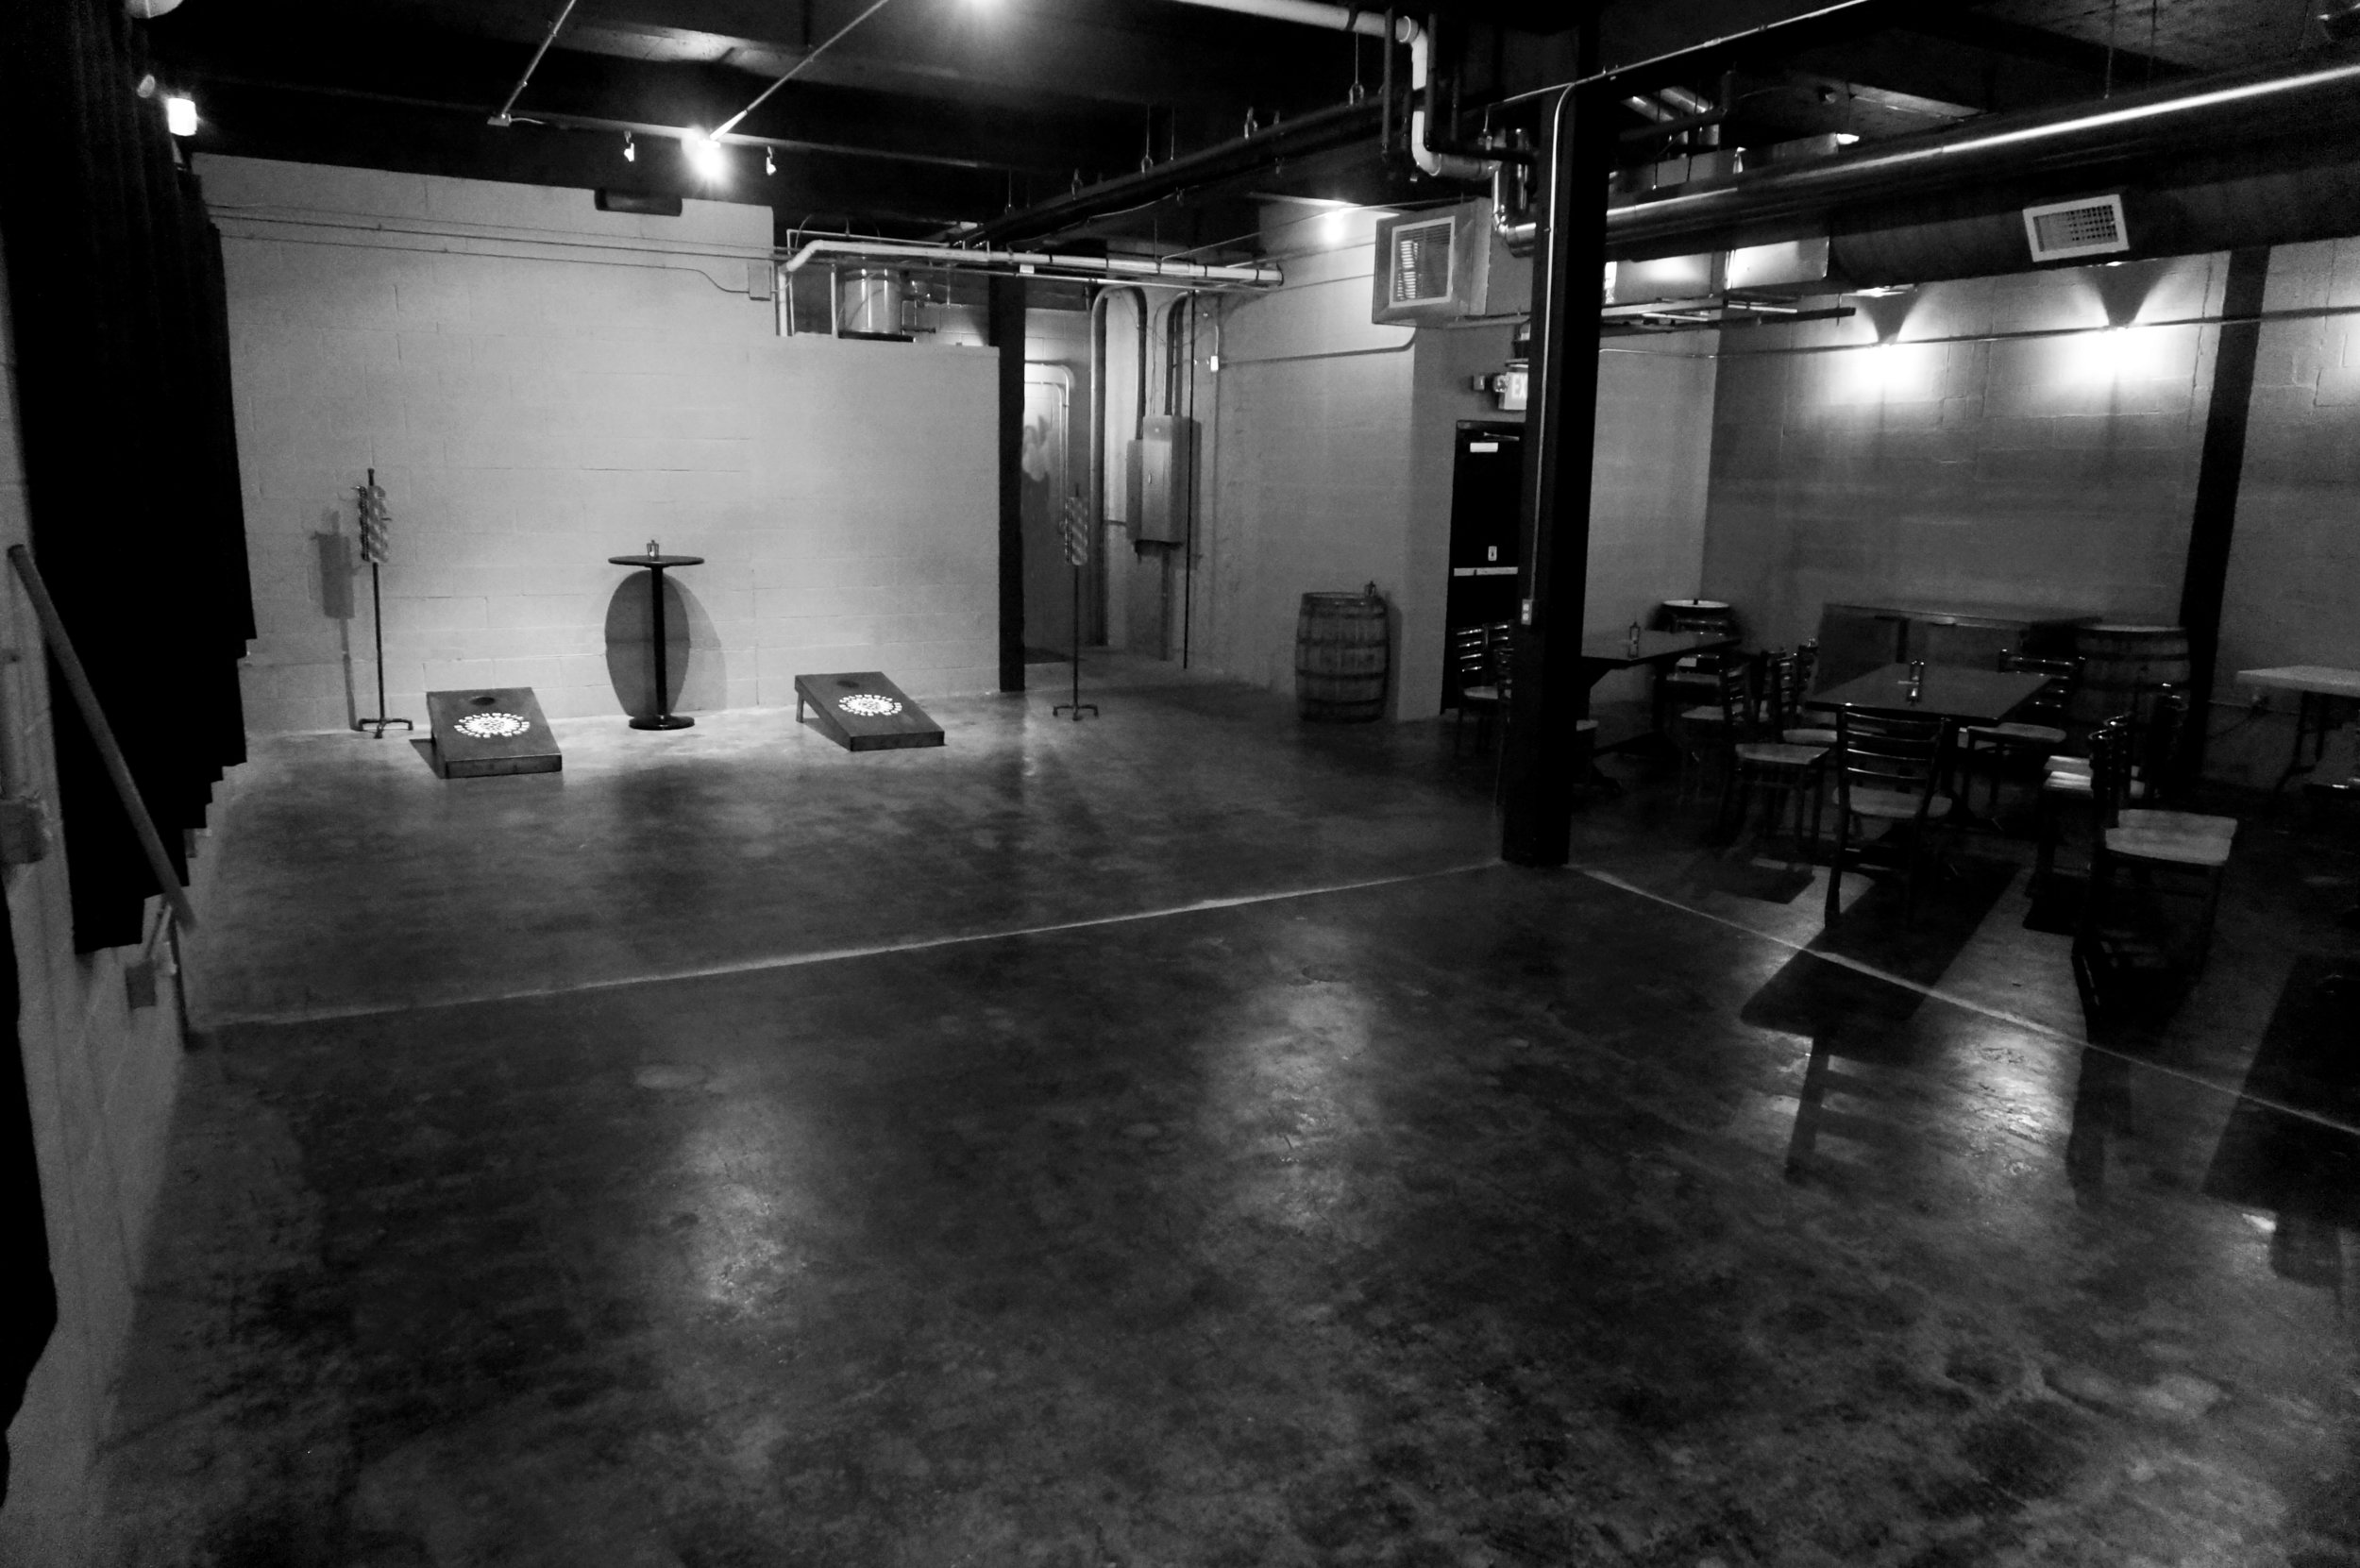 Cornhole Room sans decor